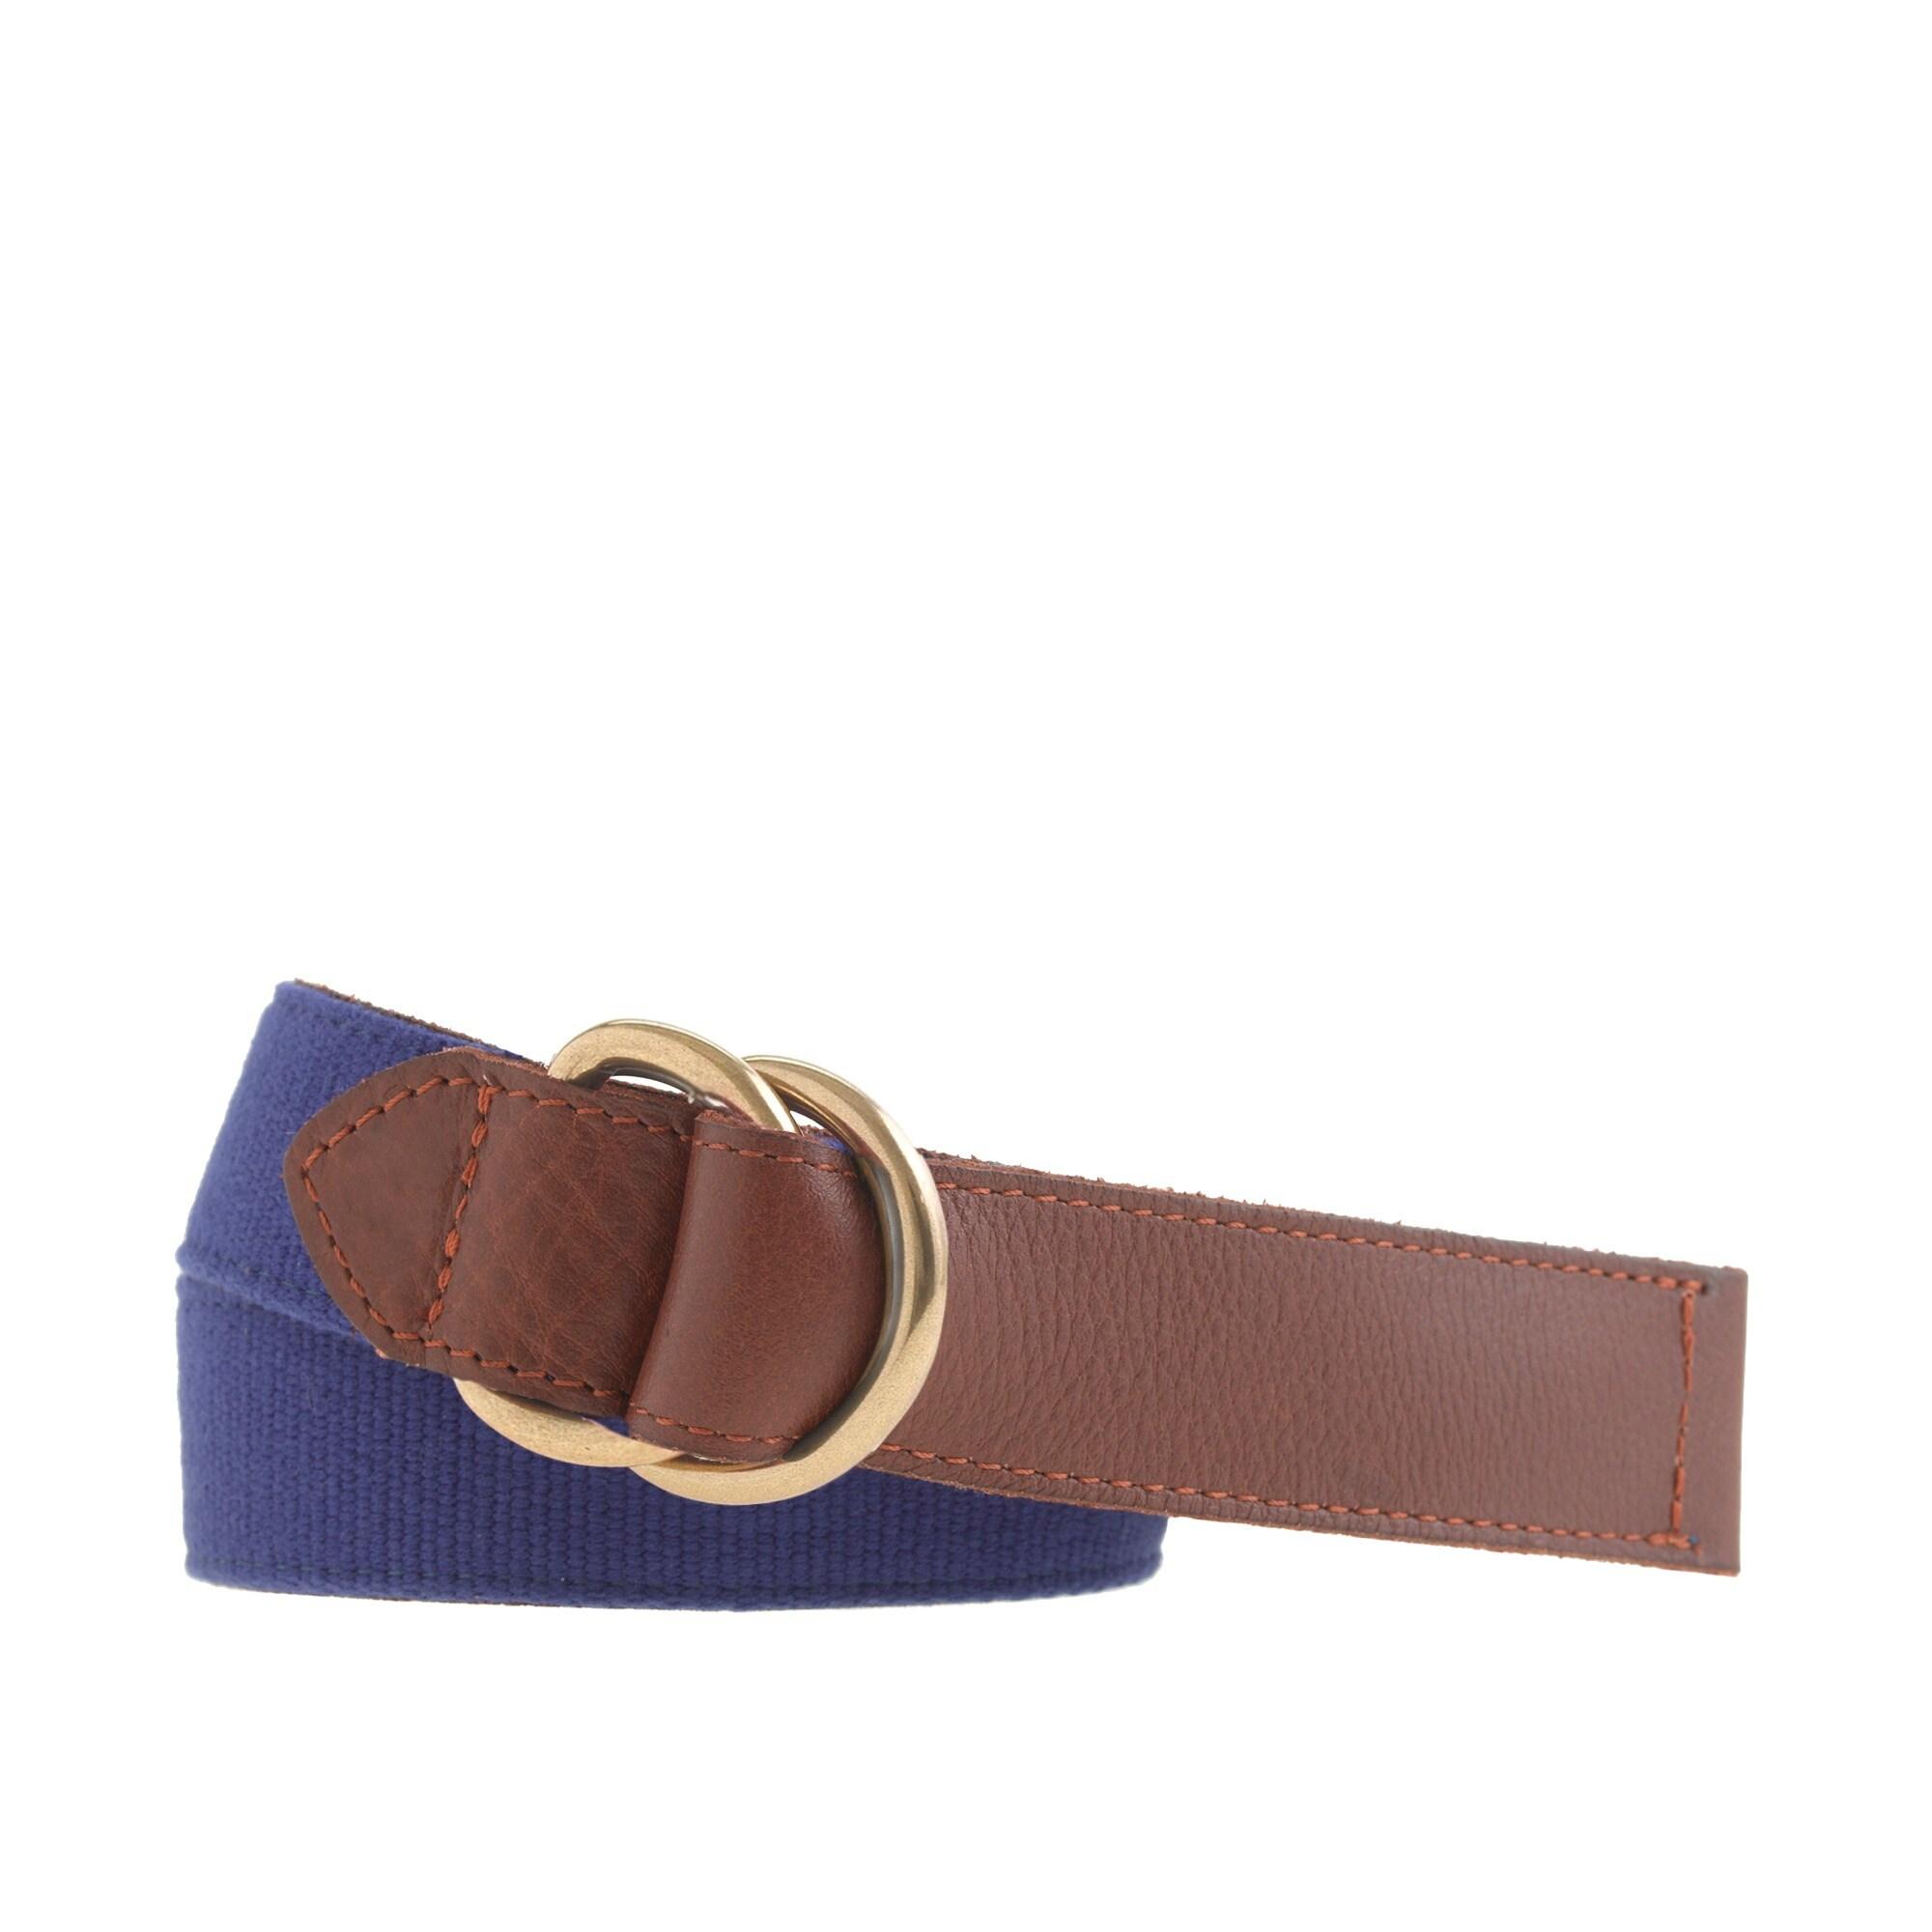 boys' reversible belt :